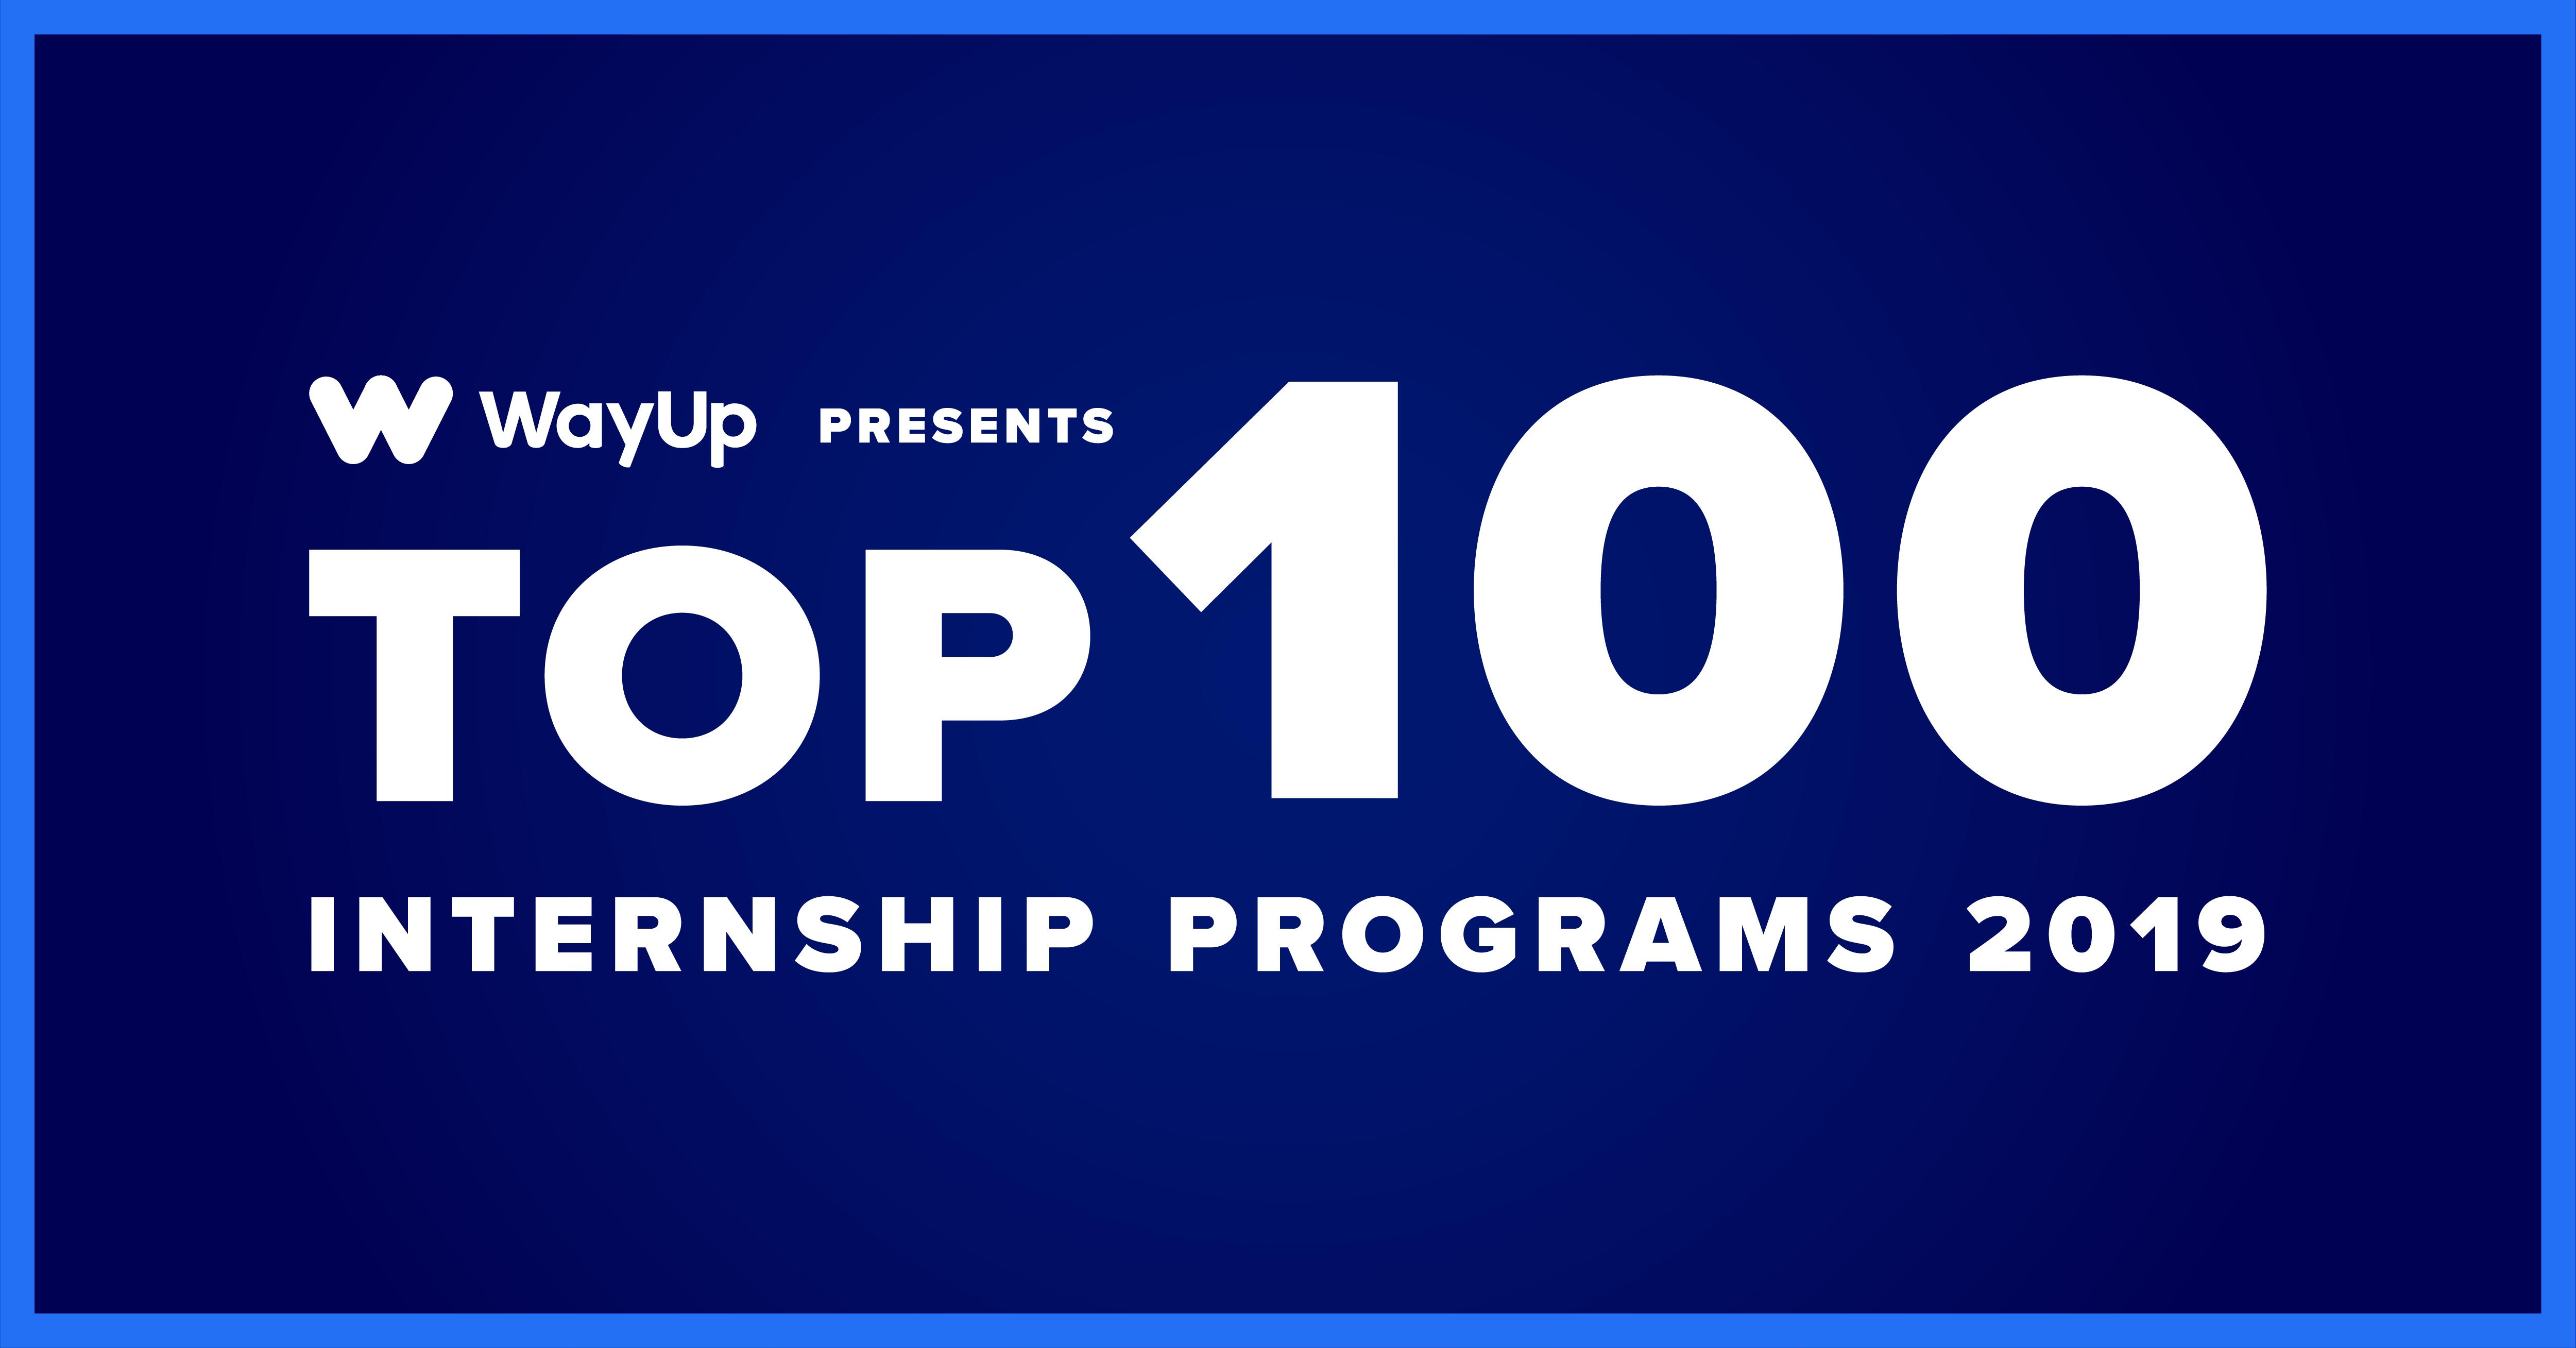 wayup-top-100-internship-logo